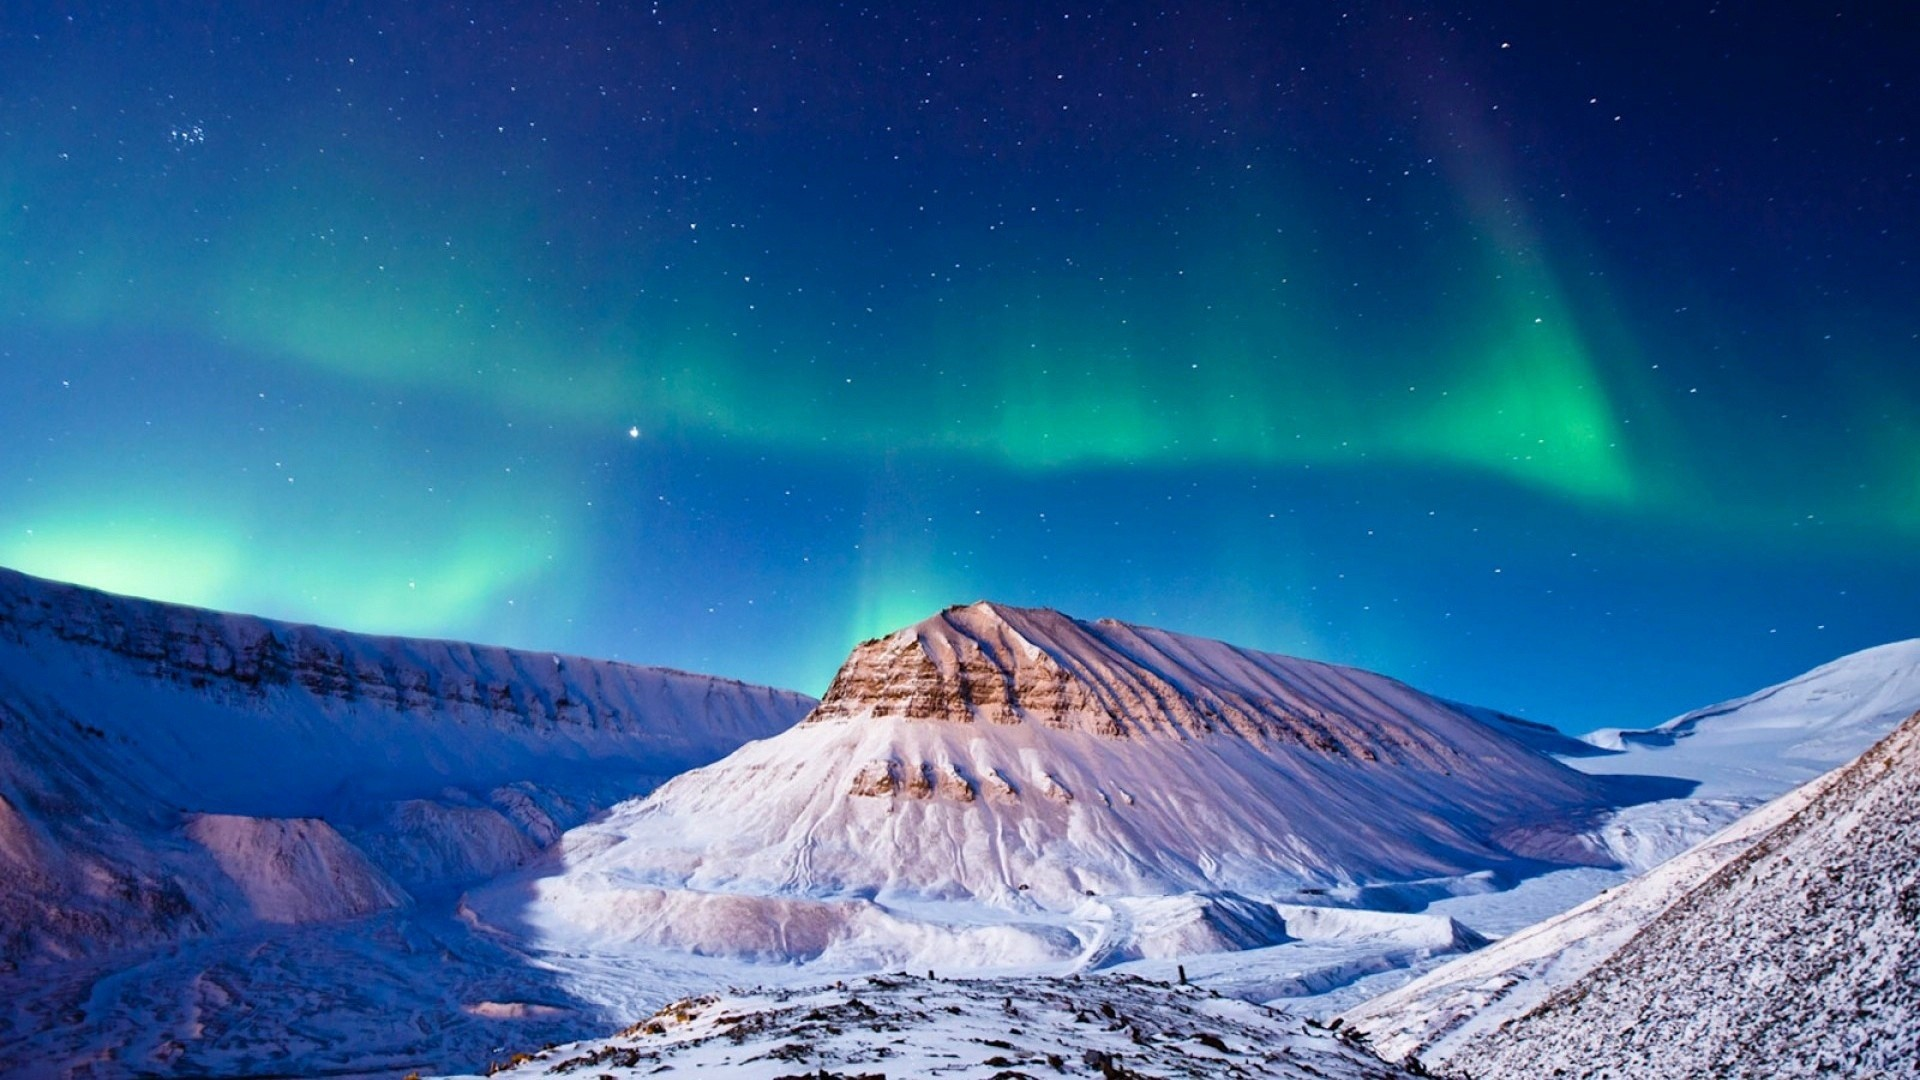 Winter Night Sky Wallpaper 64 Images